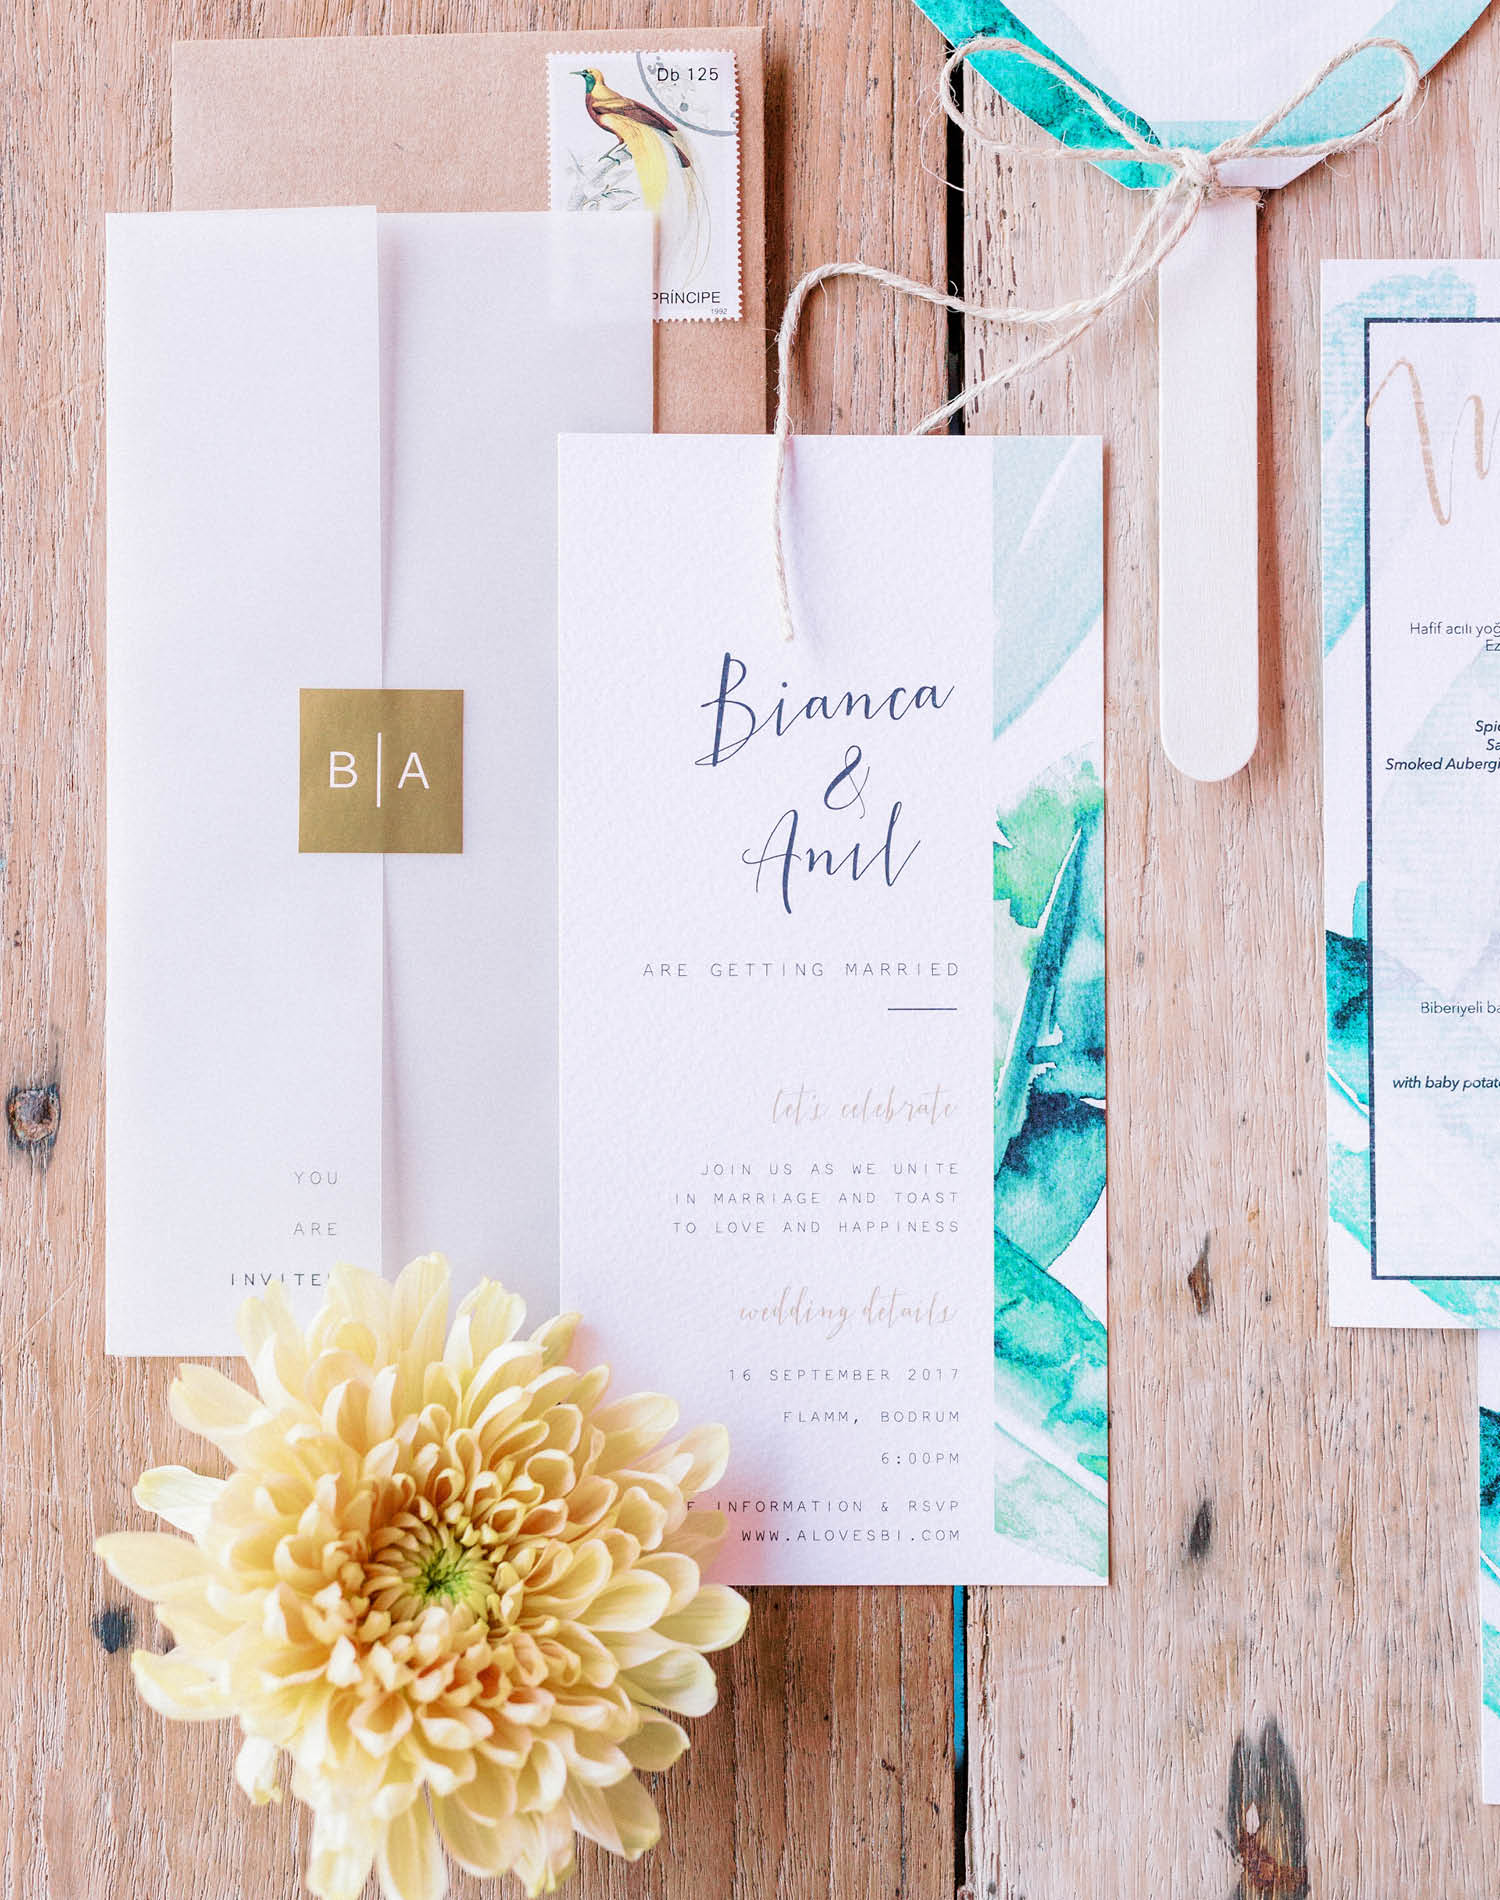 Elopement Wedding Photograher - Flamm Bodrum Wedding Invitation Suit